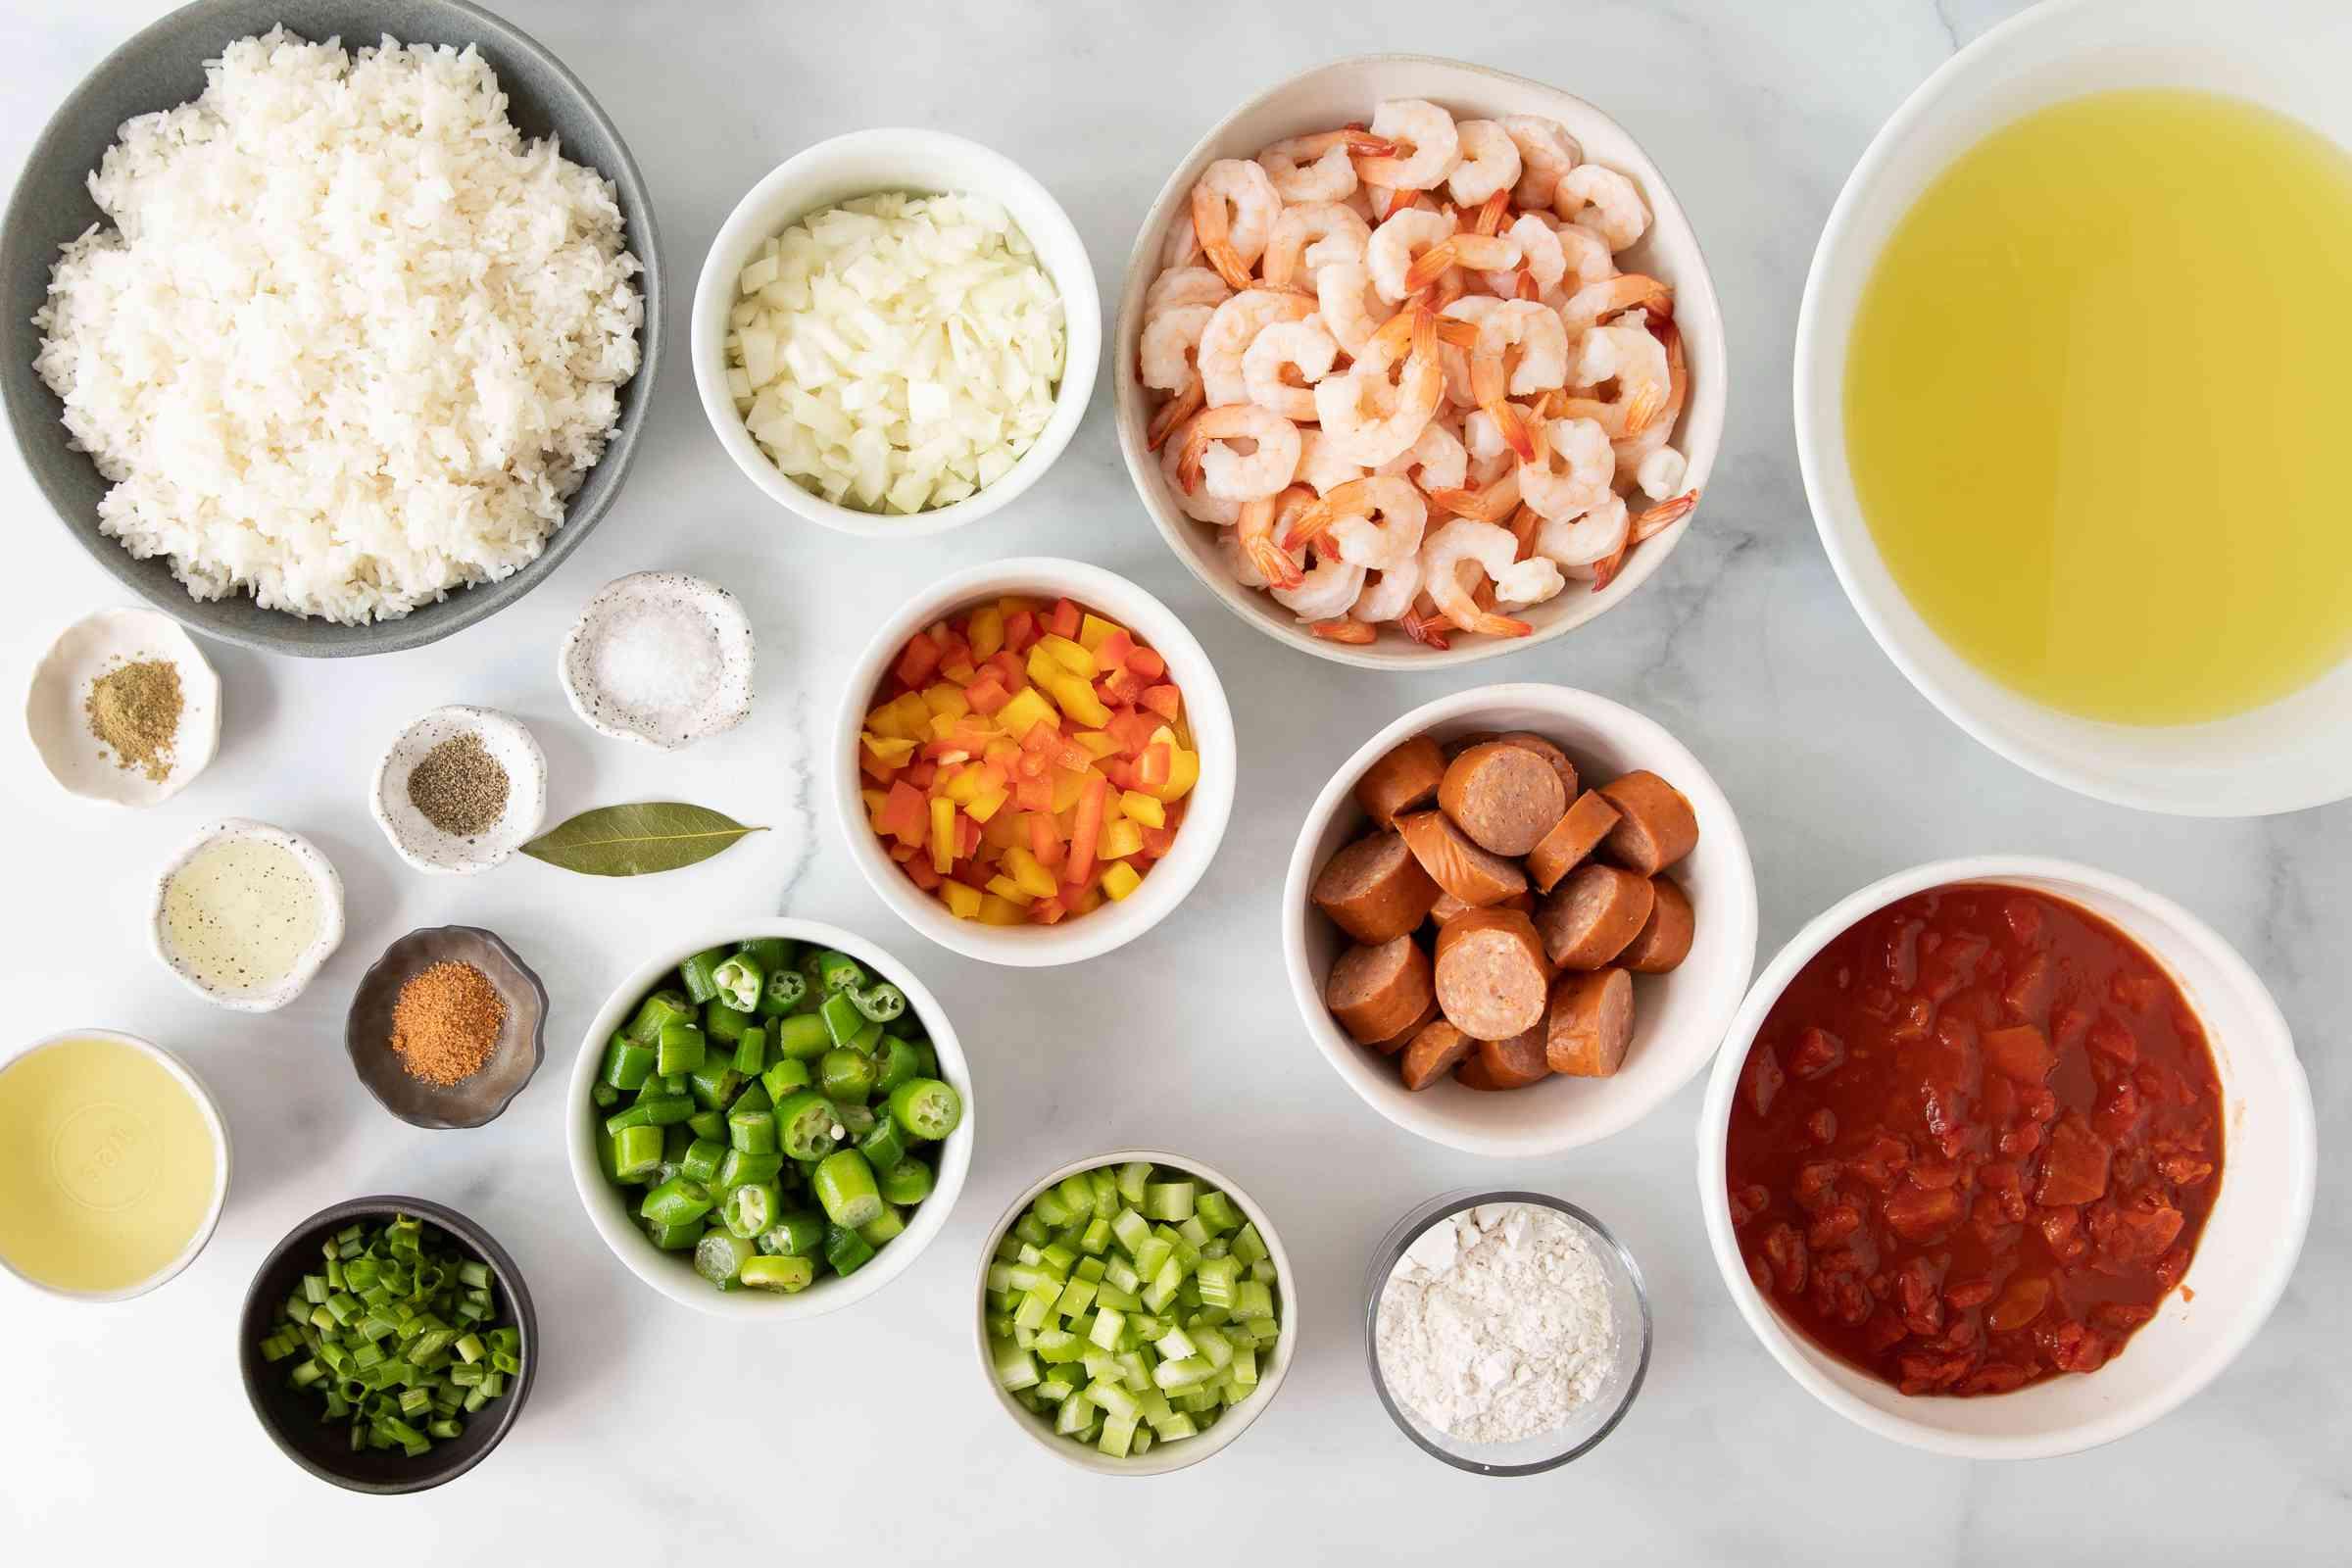 Shrimp and Sausage Gumbo ingredients